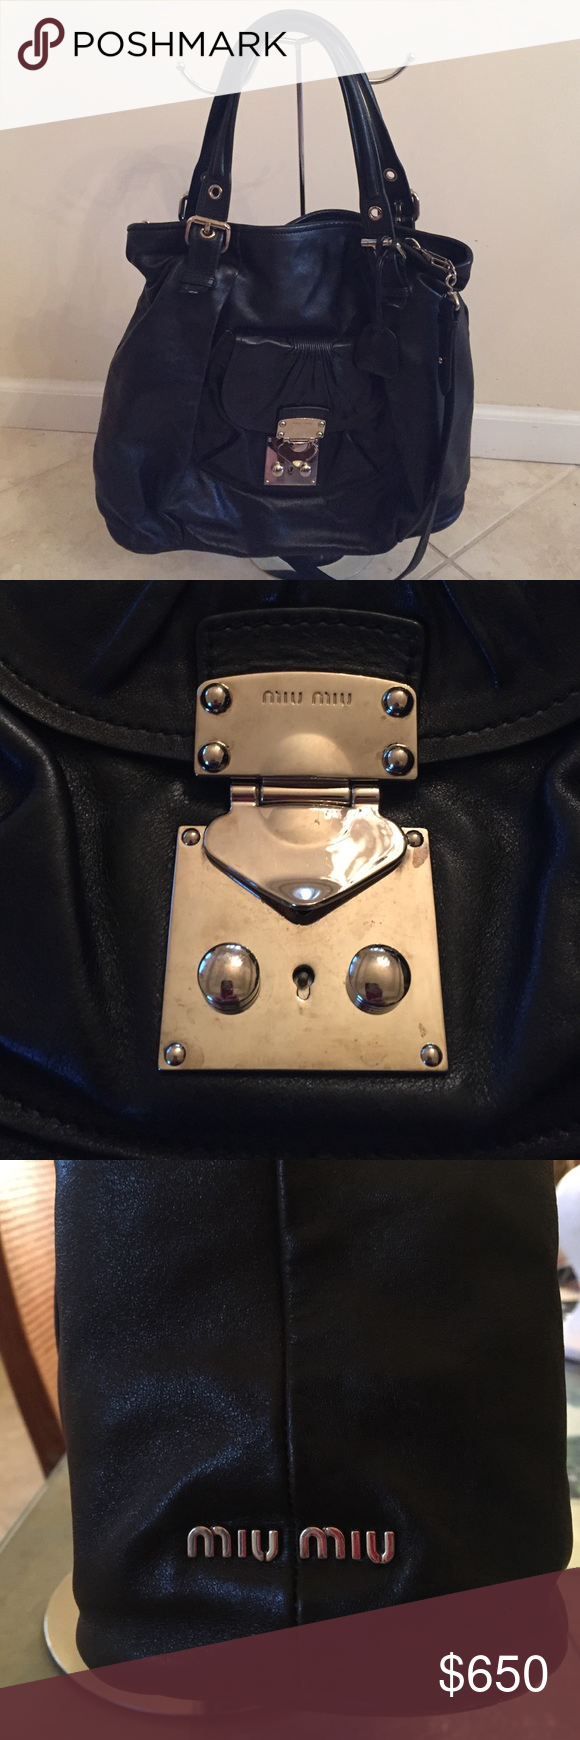 c1c96b322dd3a Authentic Miu Miu Nappa Leather Tote Bag Beautiful authentic Miu Miu Nappa  leather tote. Removable adjustable strap. Handbag/Satchel/Crossbody all in  one.